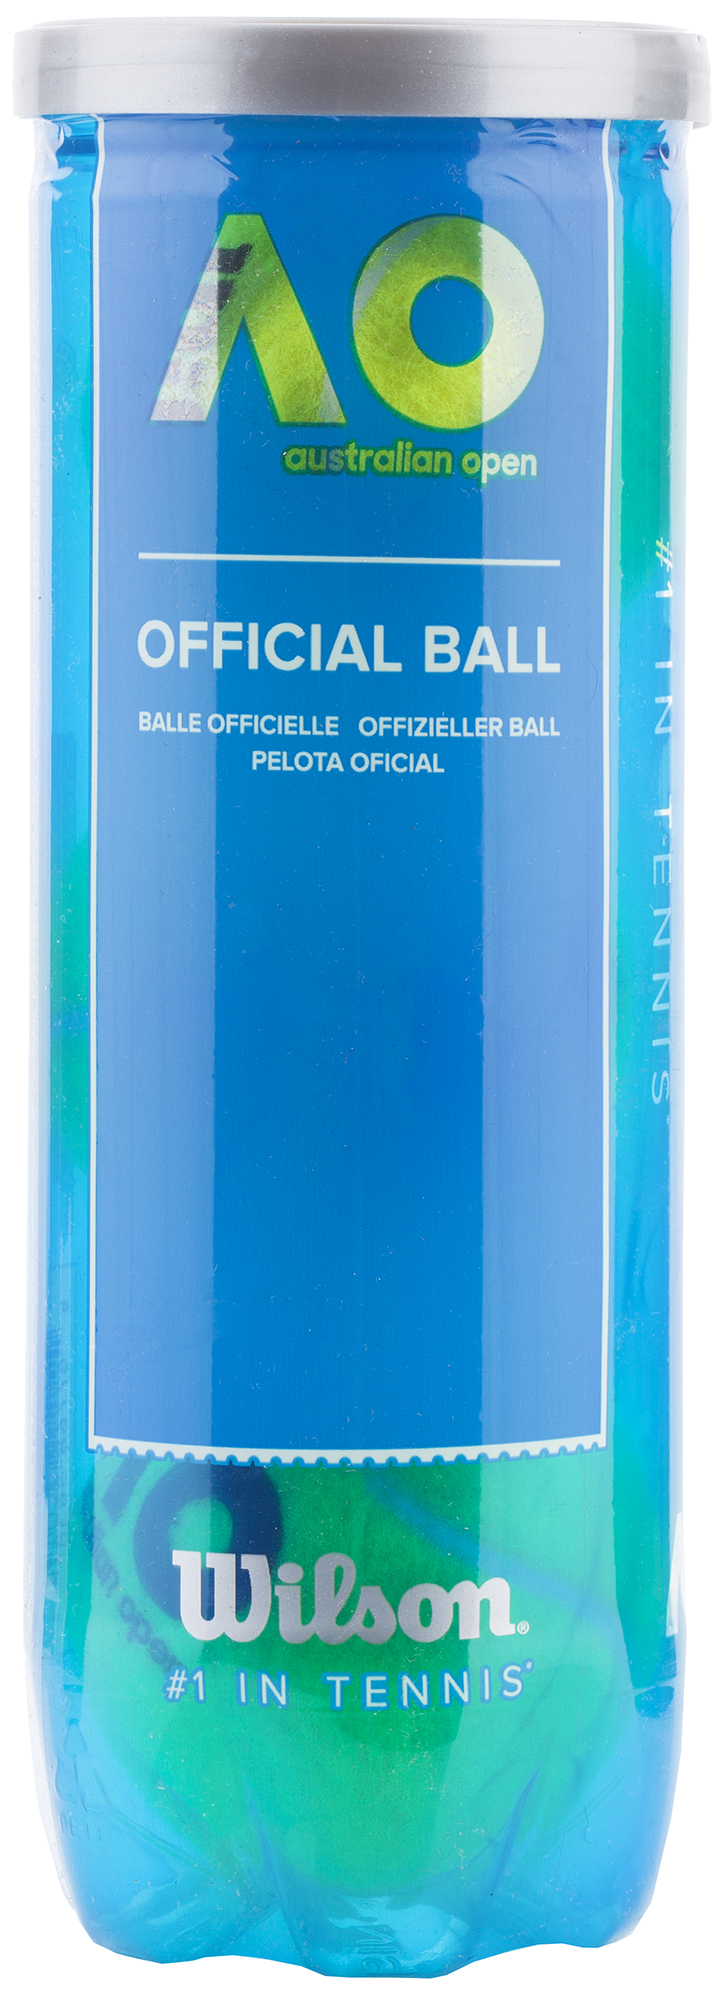 Wilson Набор мячей для большого тенниса Wilson AUSTRALIAN OPEN 3 BALL CAN, размер Без размера кастрюля regent inox linea promo 4 5l 22x12cm 94 1005